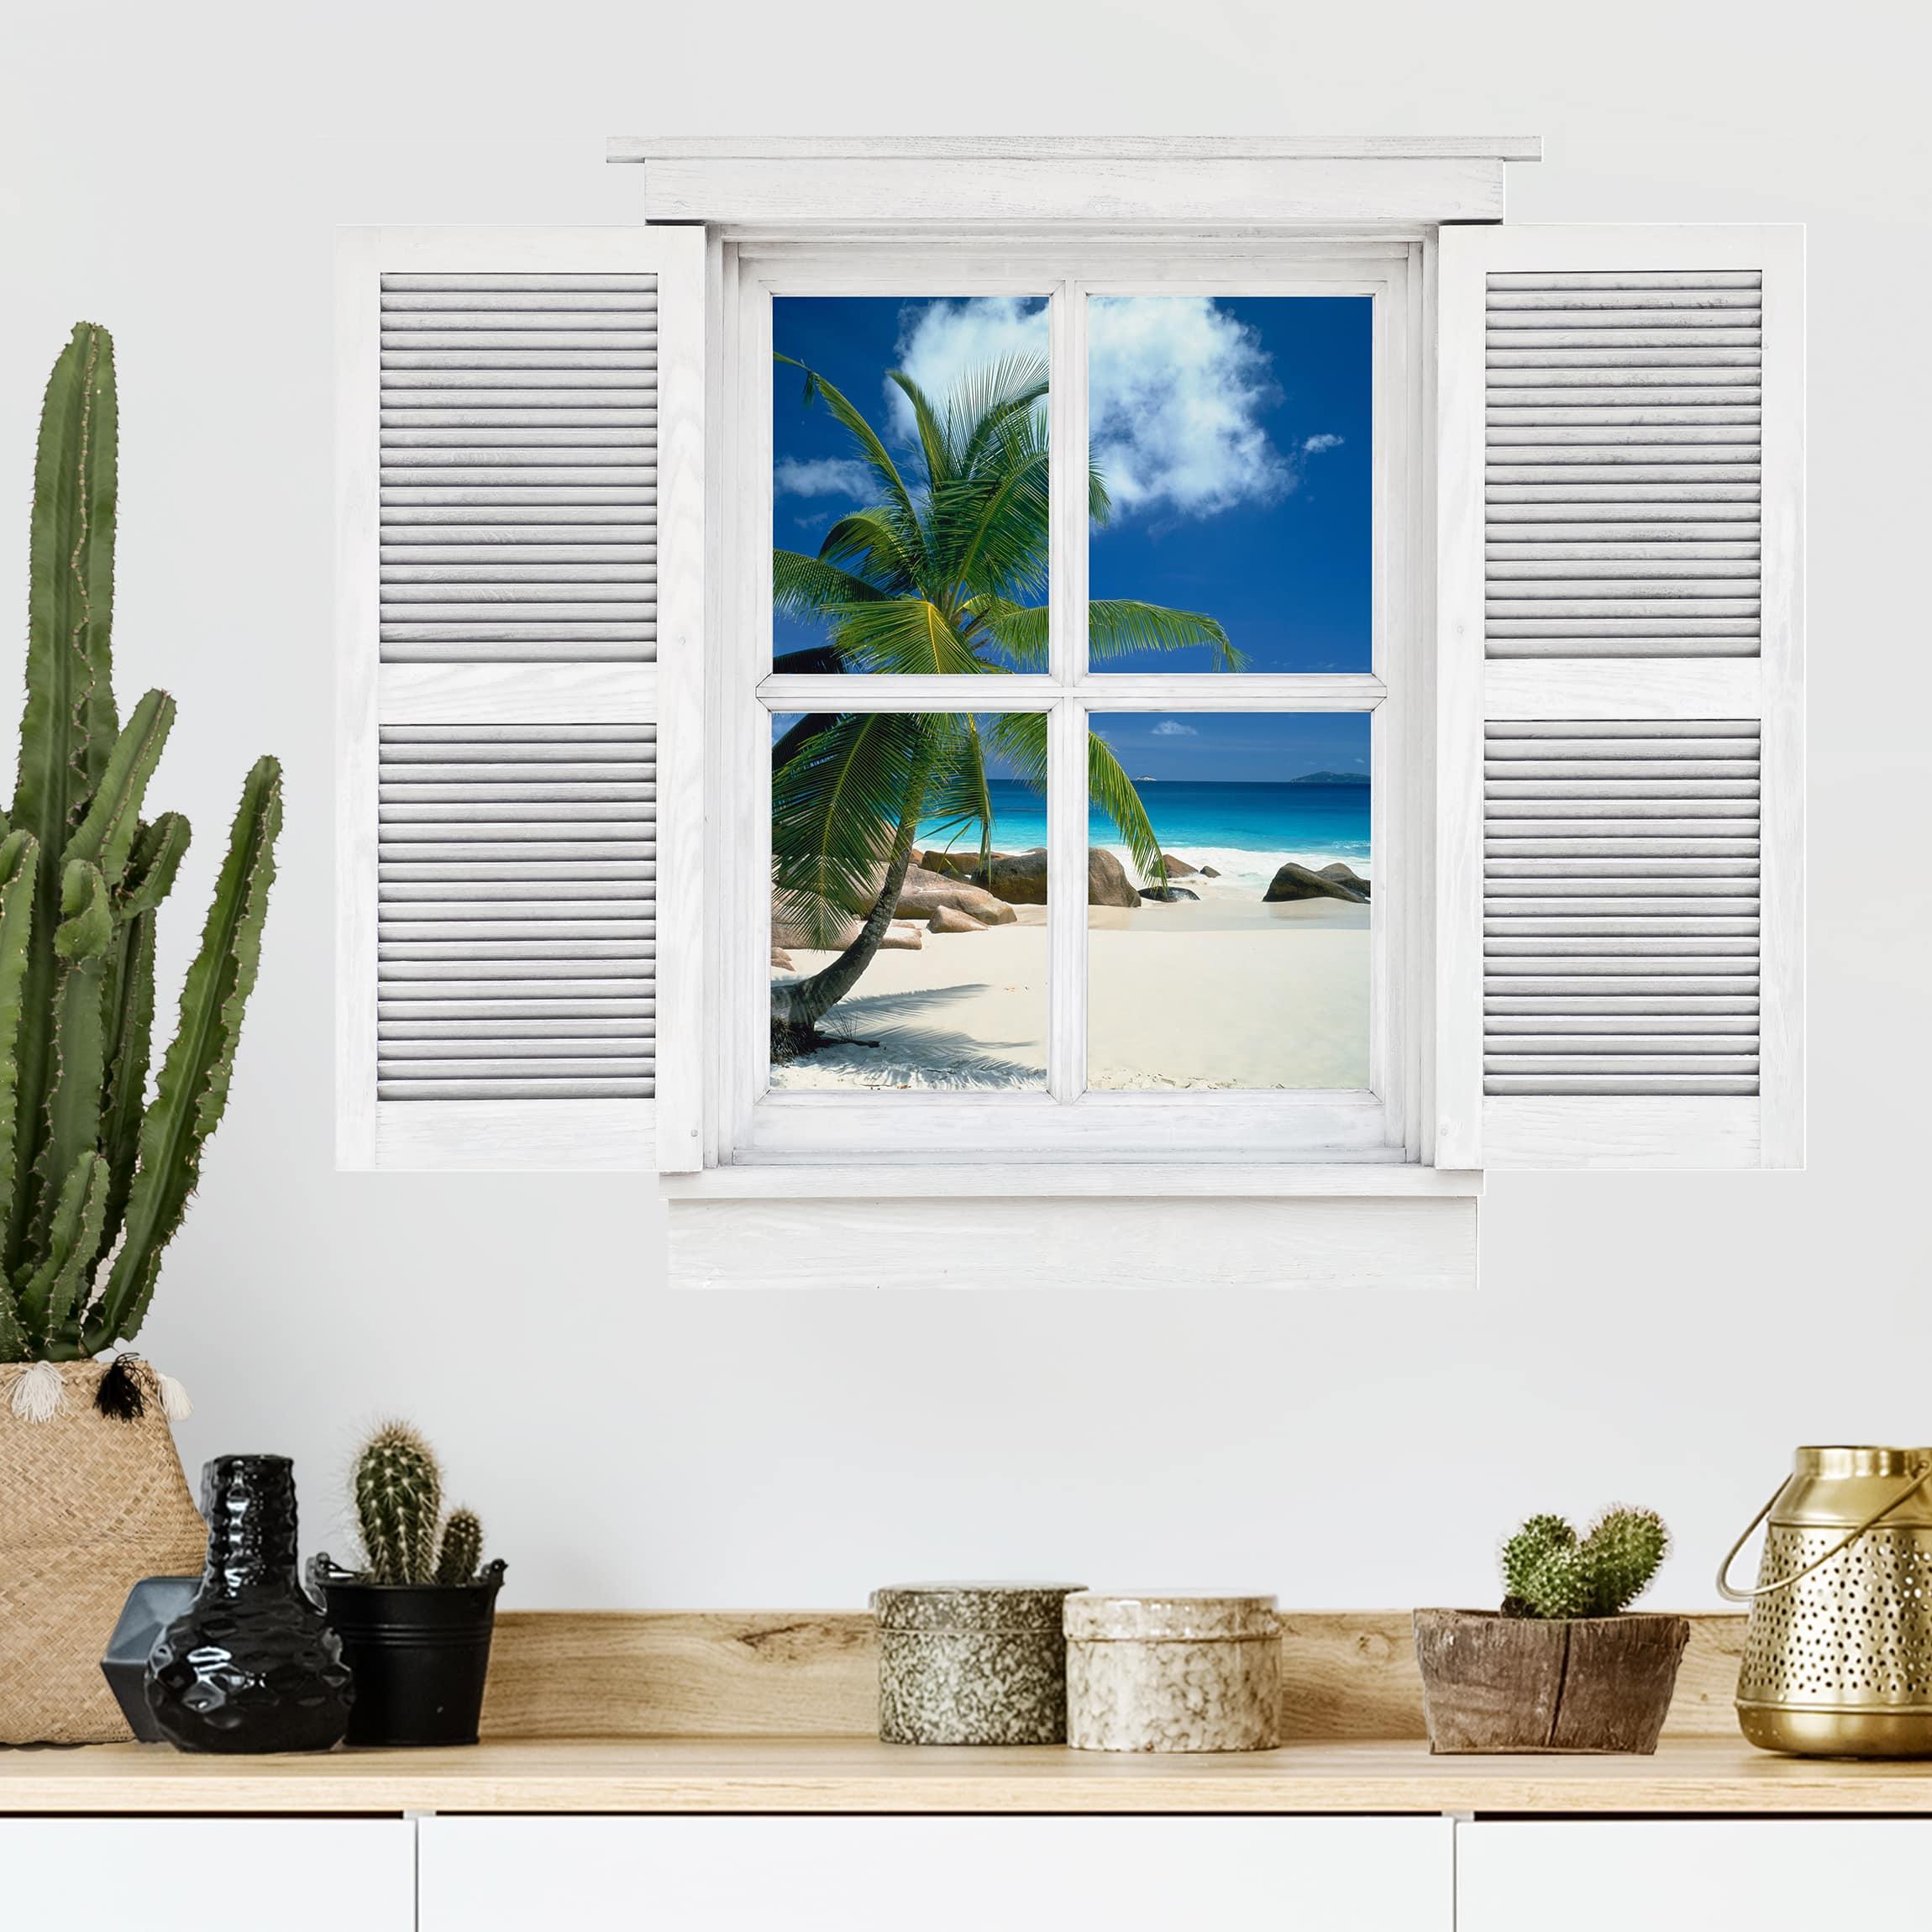 Trompe L Oeil Adesivi Murali.Trompe L Oeil Adesivi Murali Finestra Su Spiaggia Da Sogno